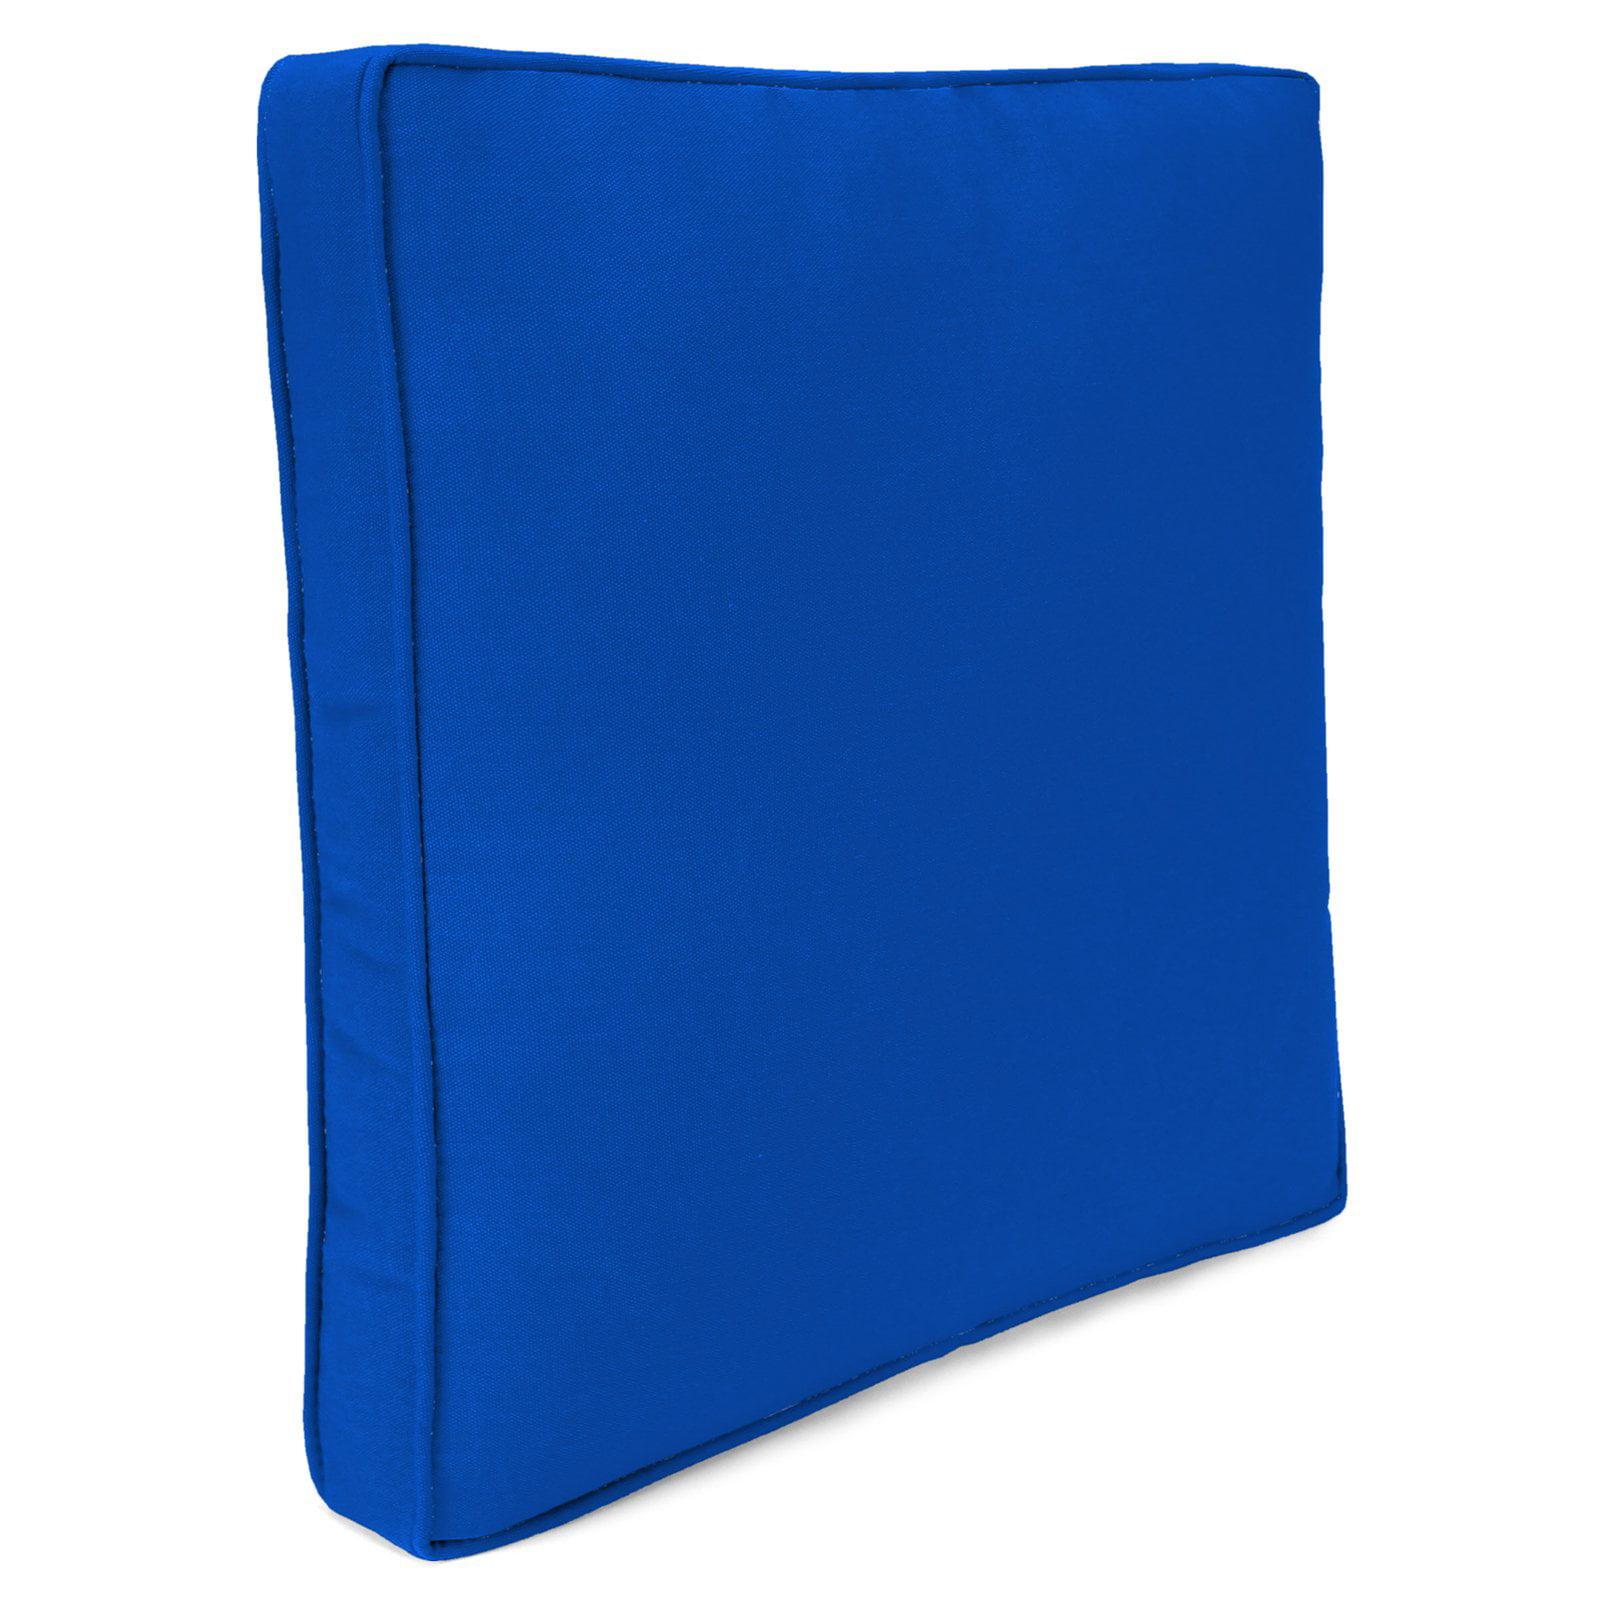 Jordan Manufacturing Sunbrella 16 x 16 in. Box Pillow